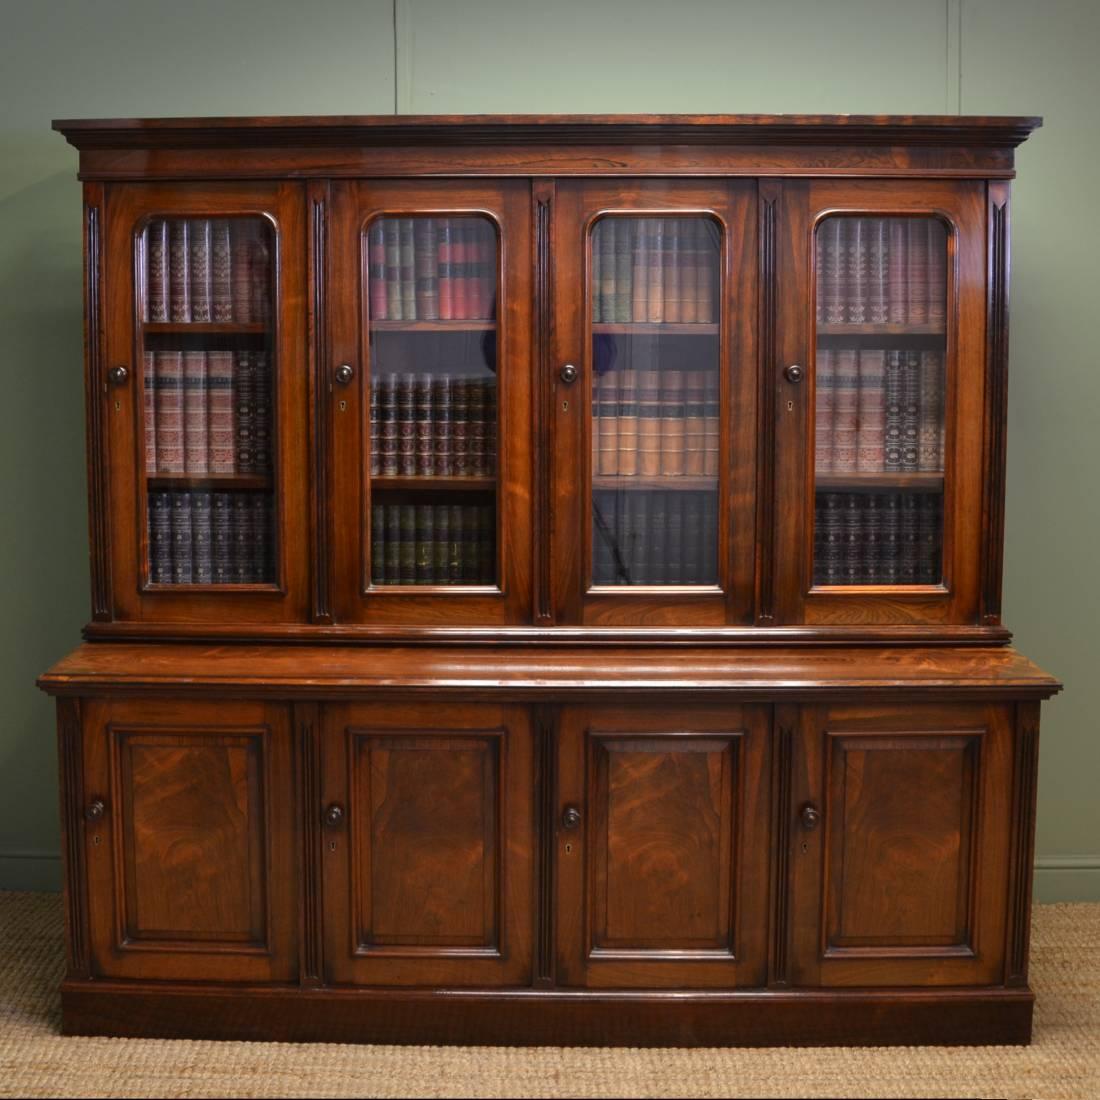 Antique Bookshelves: Spectacular Figured Rosewood Victorian Antique Library